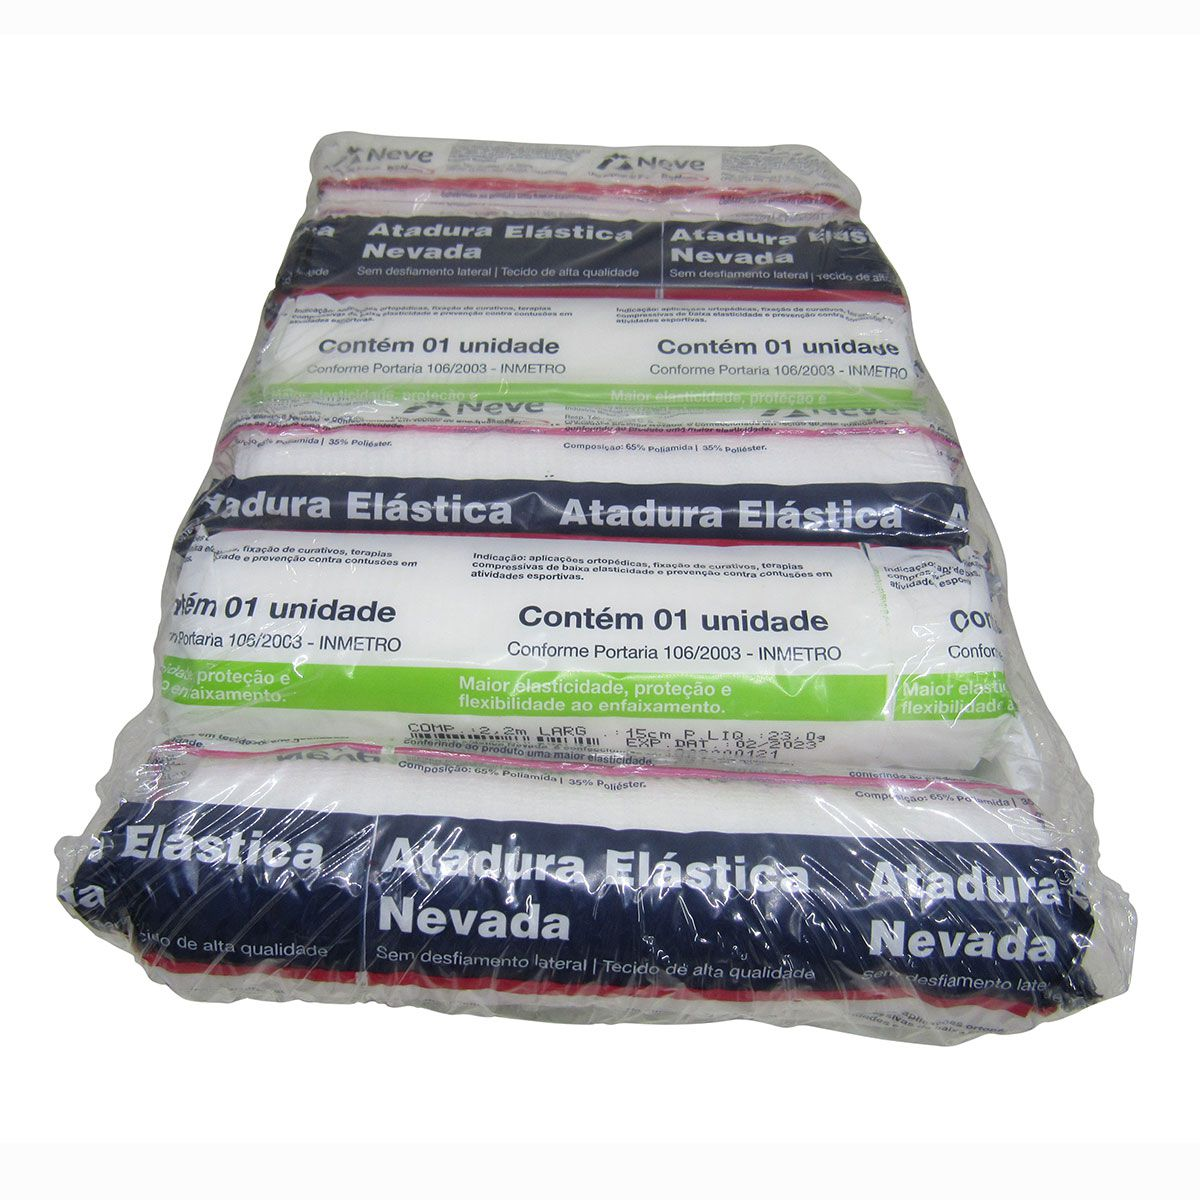 Atadura Elástica Nevada 15cm x 2,2m com 12un Neve